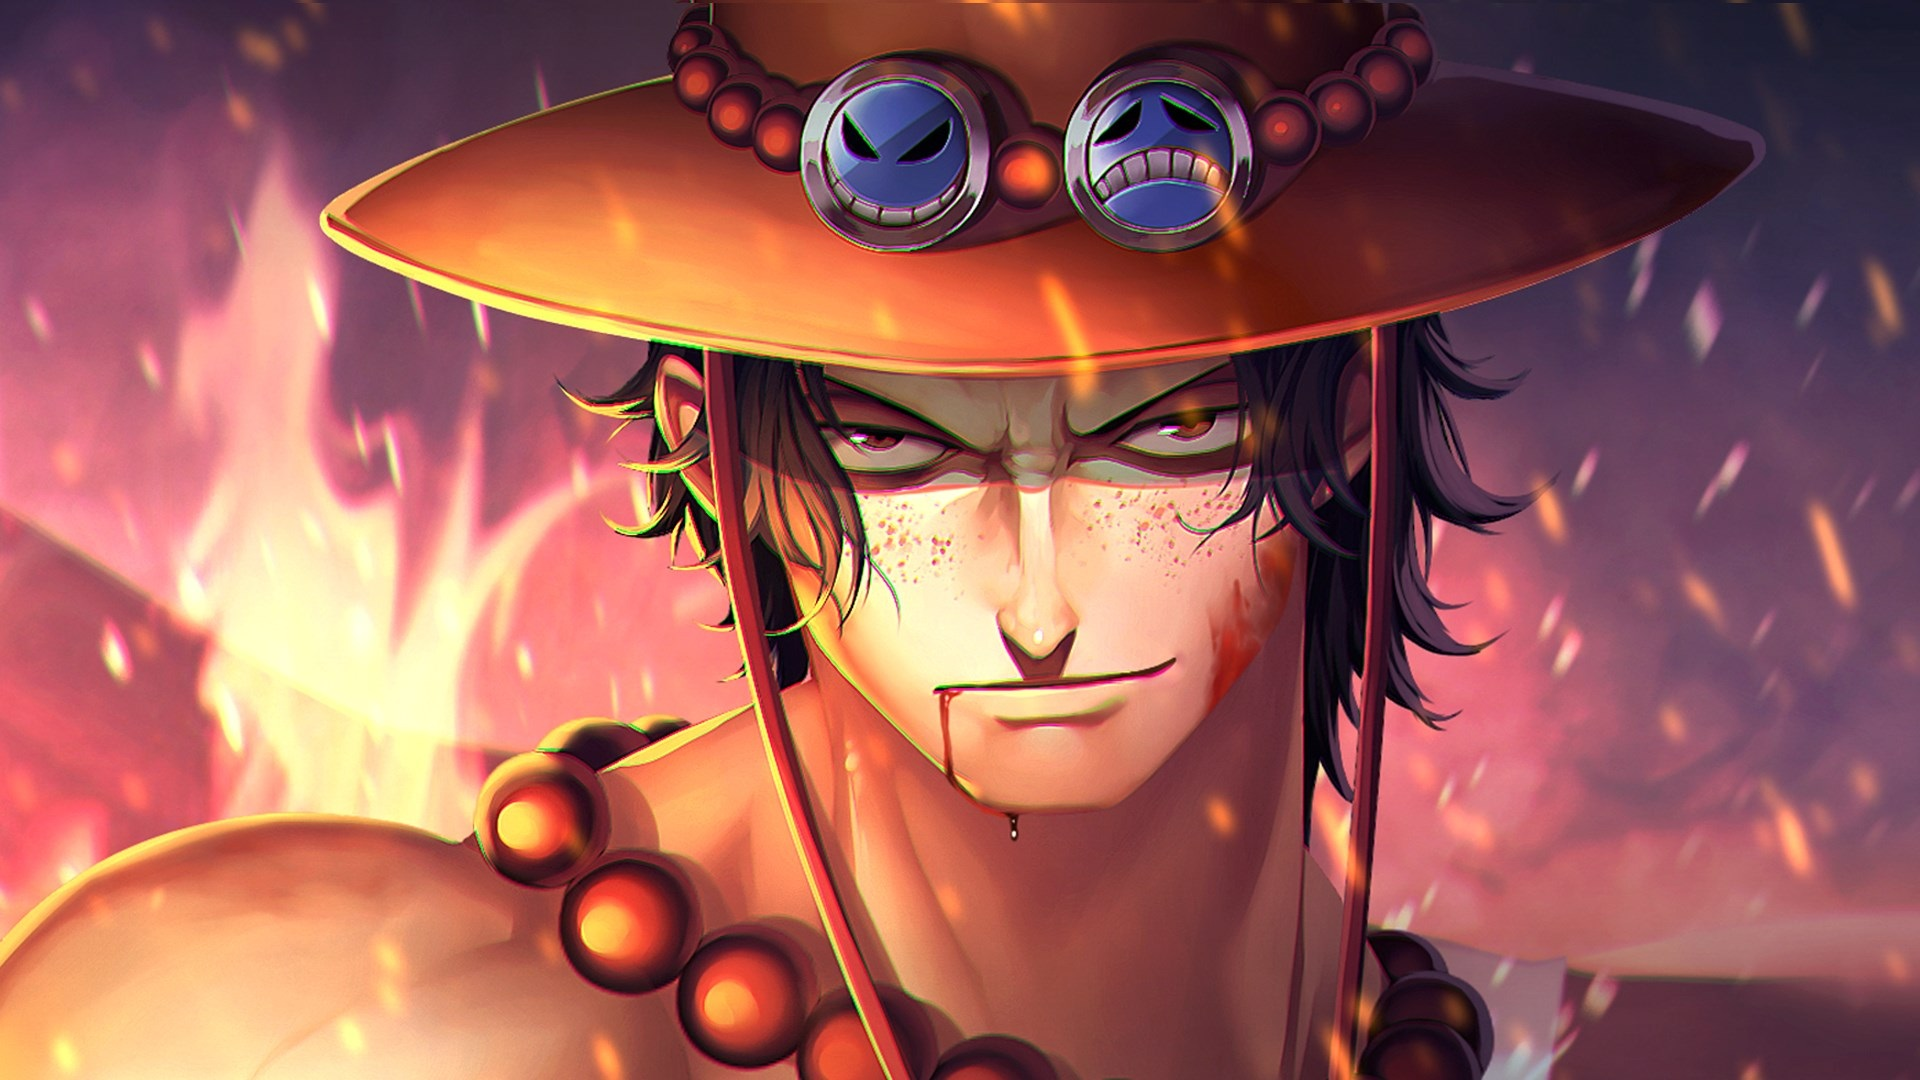 Fighter Man Anime Wallpaper